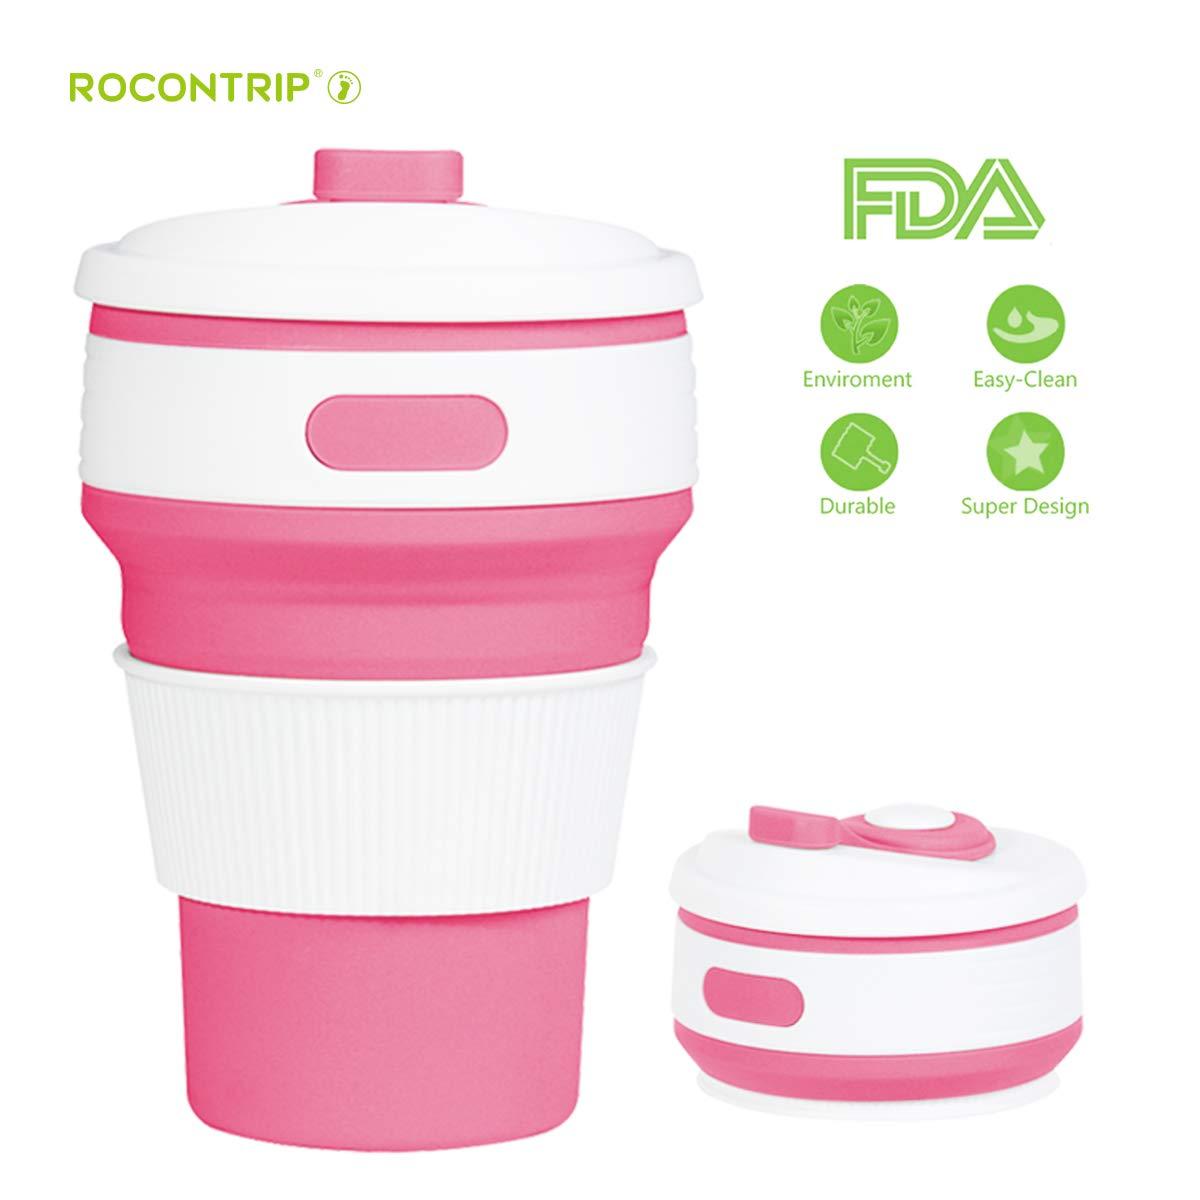 ROCONTRIP Plegable Taza, Plegado de café Taza de Viaje de Silicona a Prueba de Fugas Taza Regalo Taza 350 ML 100% de Calidad alimentaria sin BPA para ...